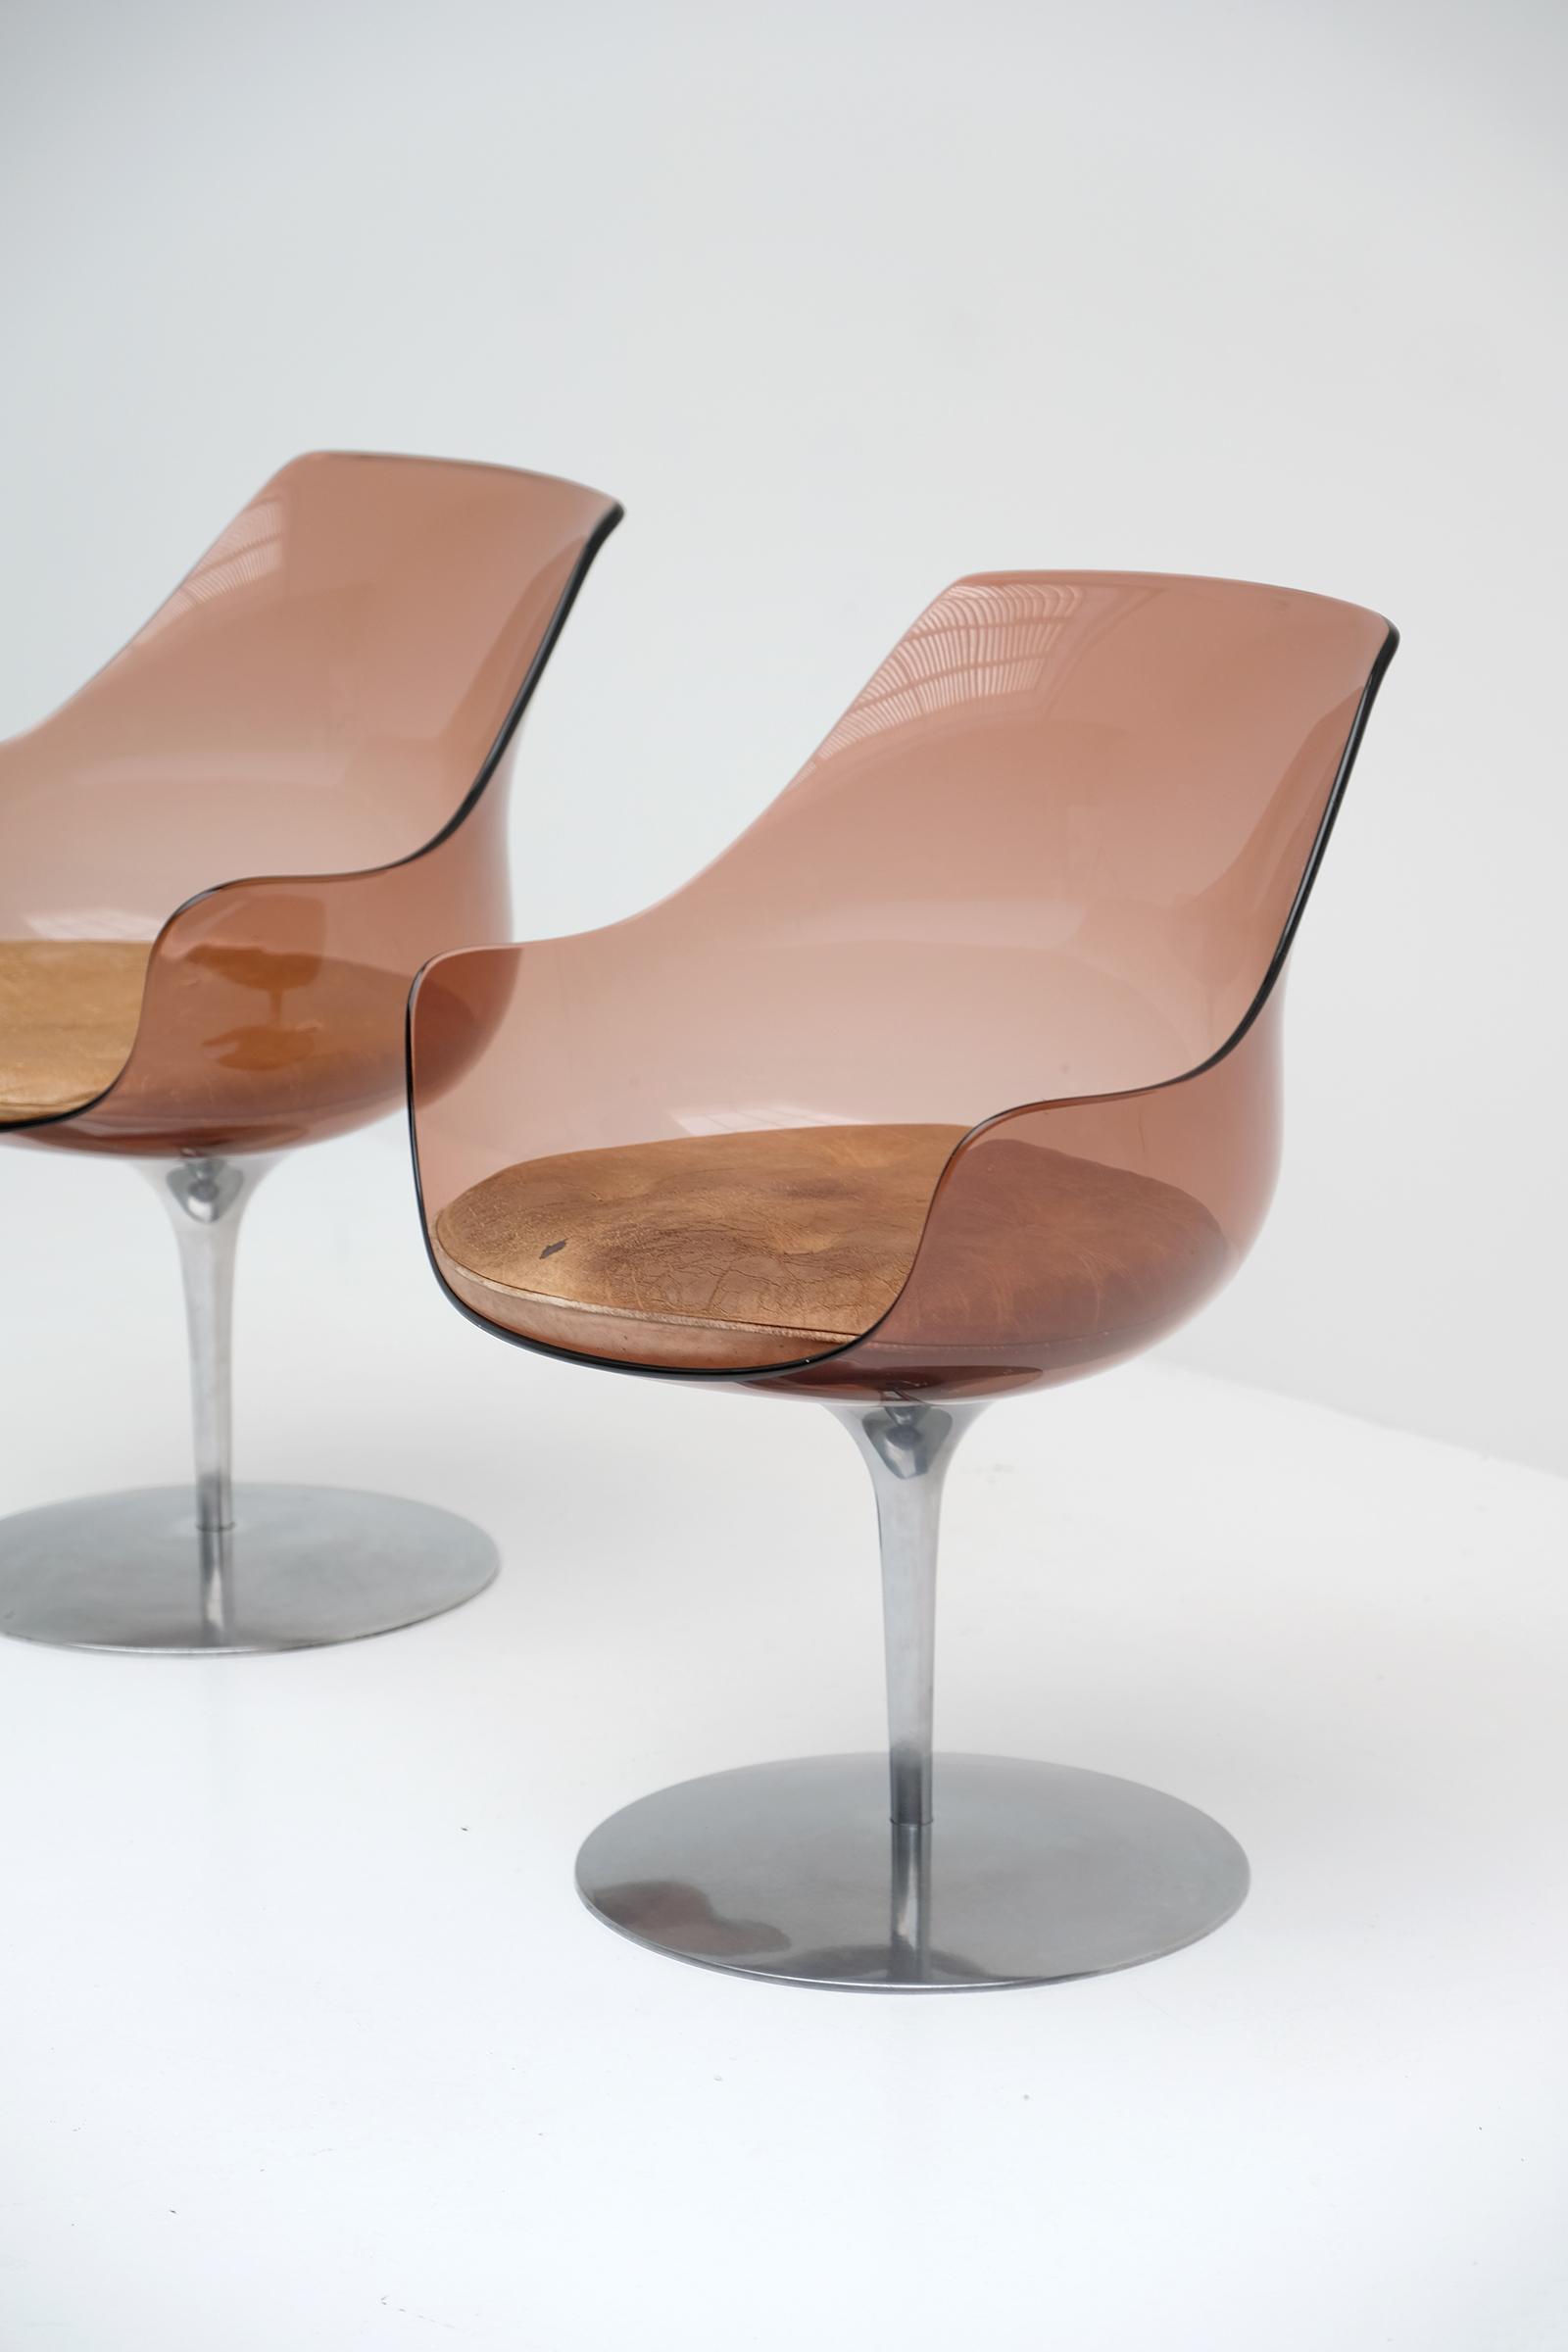 Laverne Champagne Chairs Formes Nouvellesimage 3